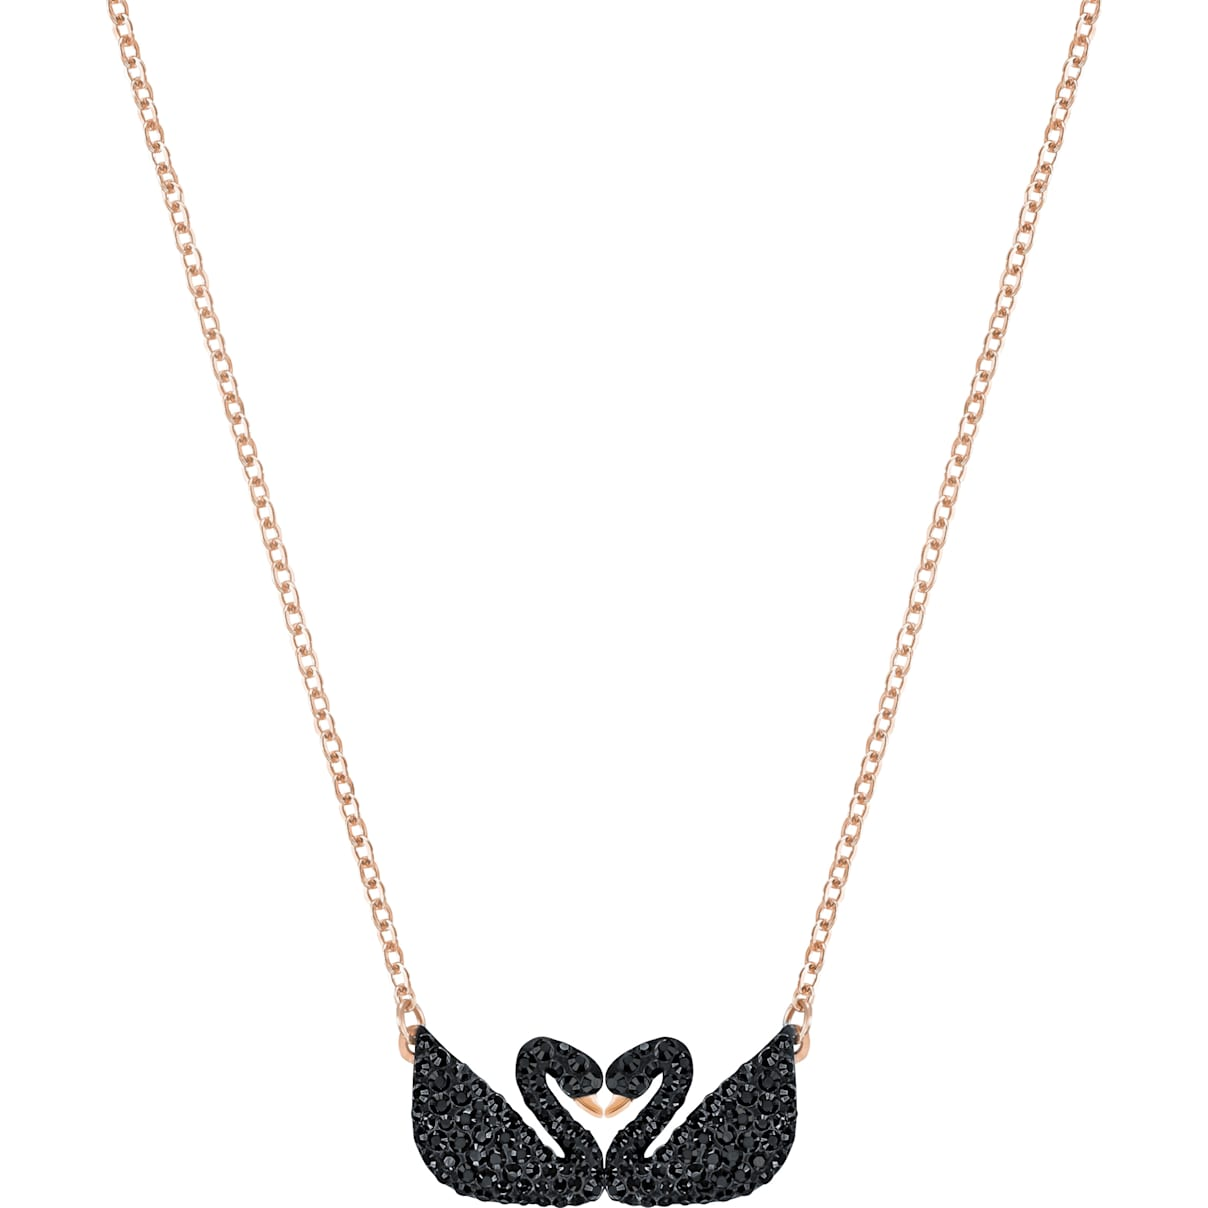 Swarovski Swarovski Iconic Swan Necklace, Black, Rose-gold tone plated